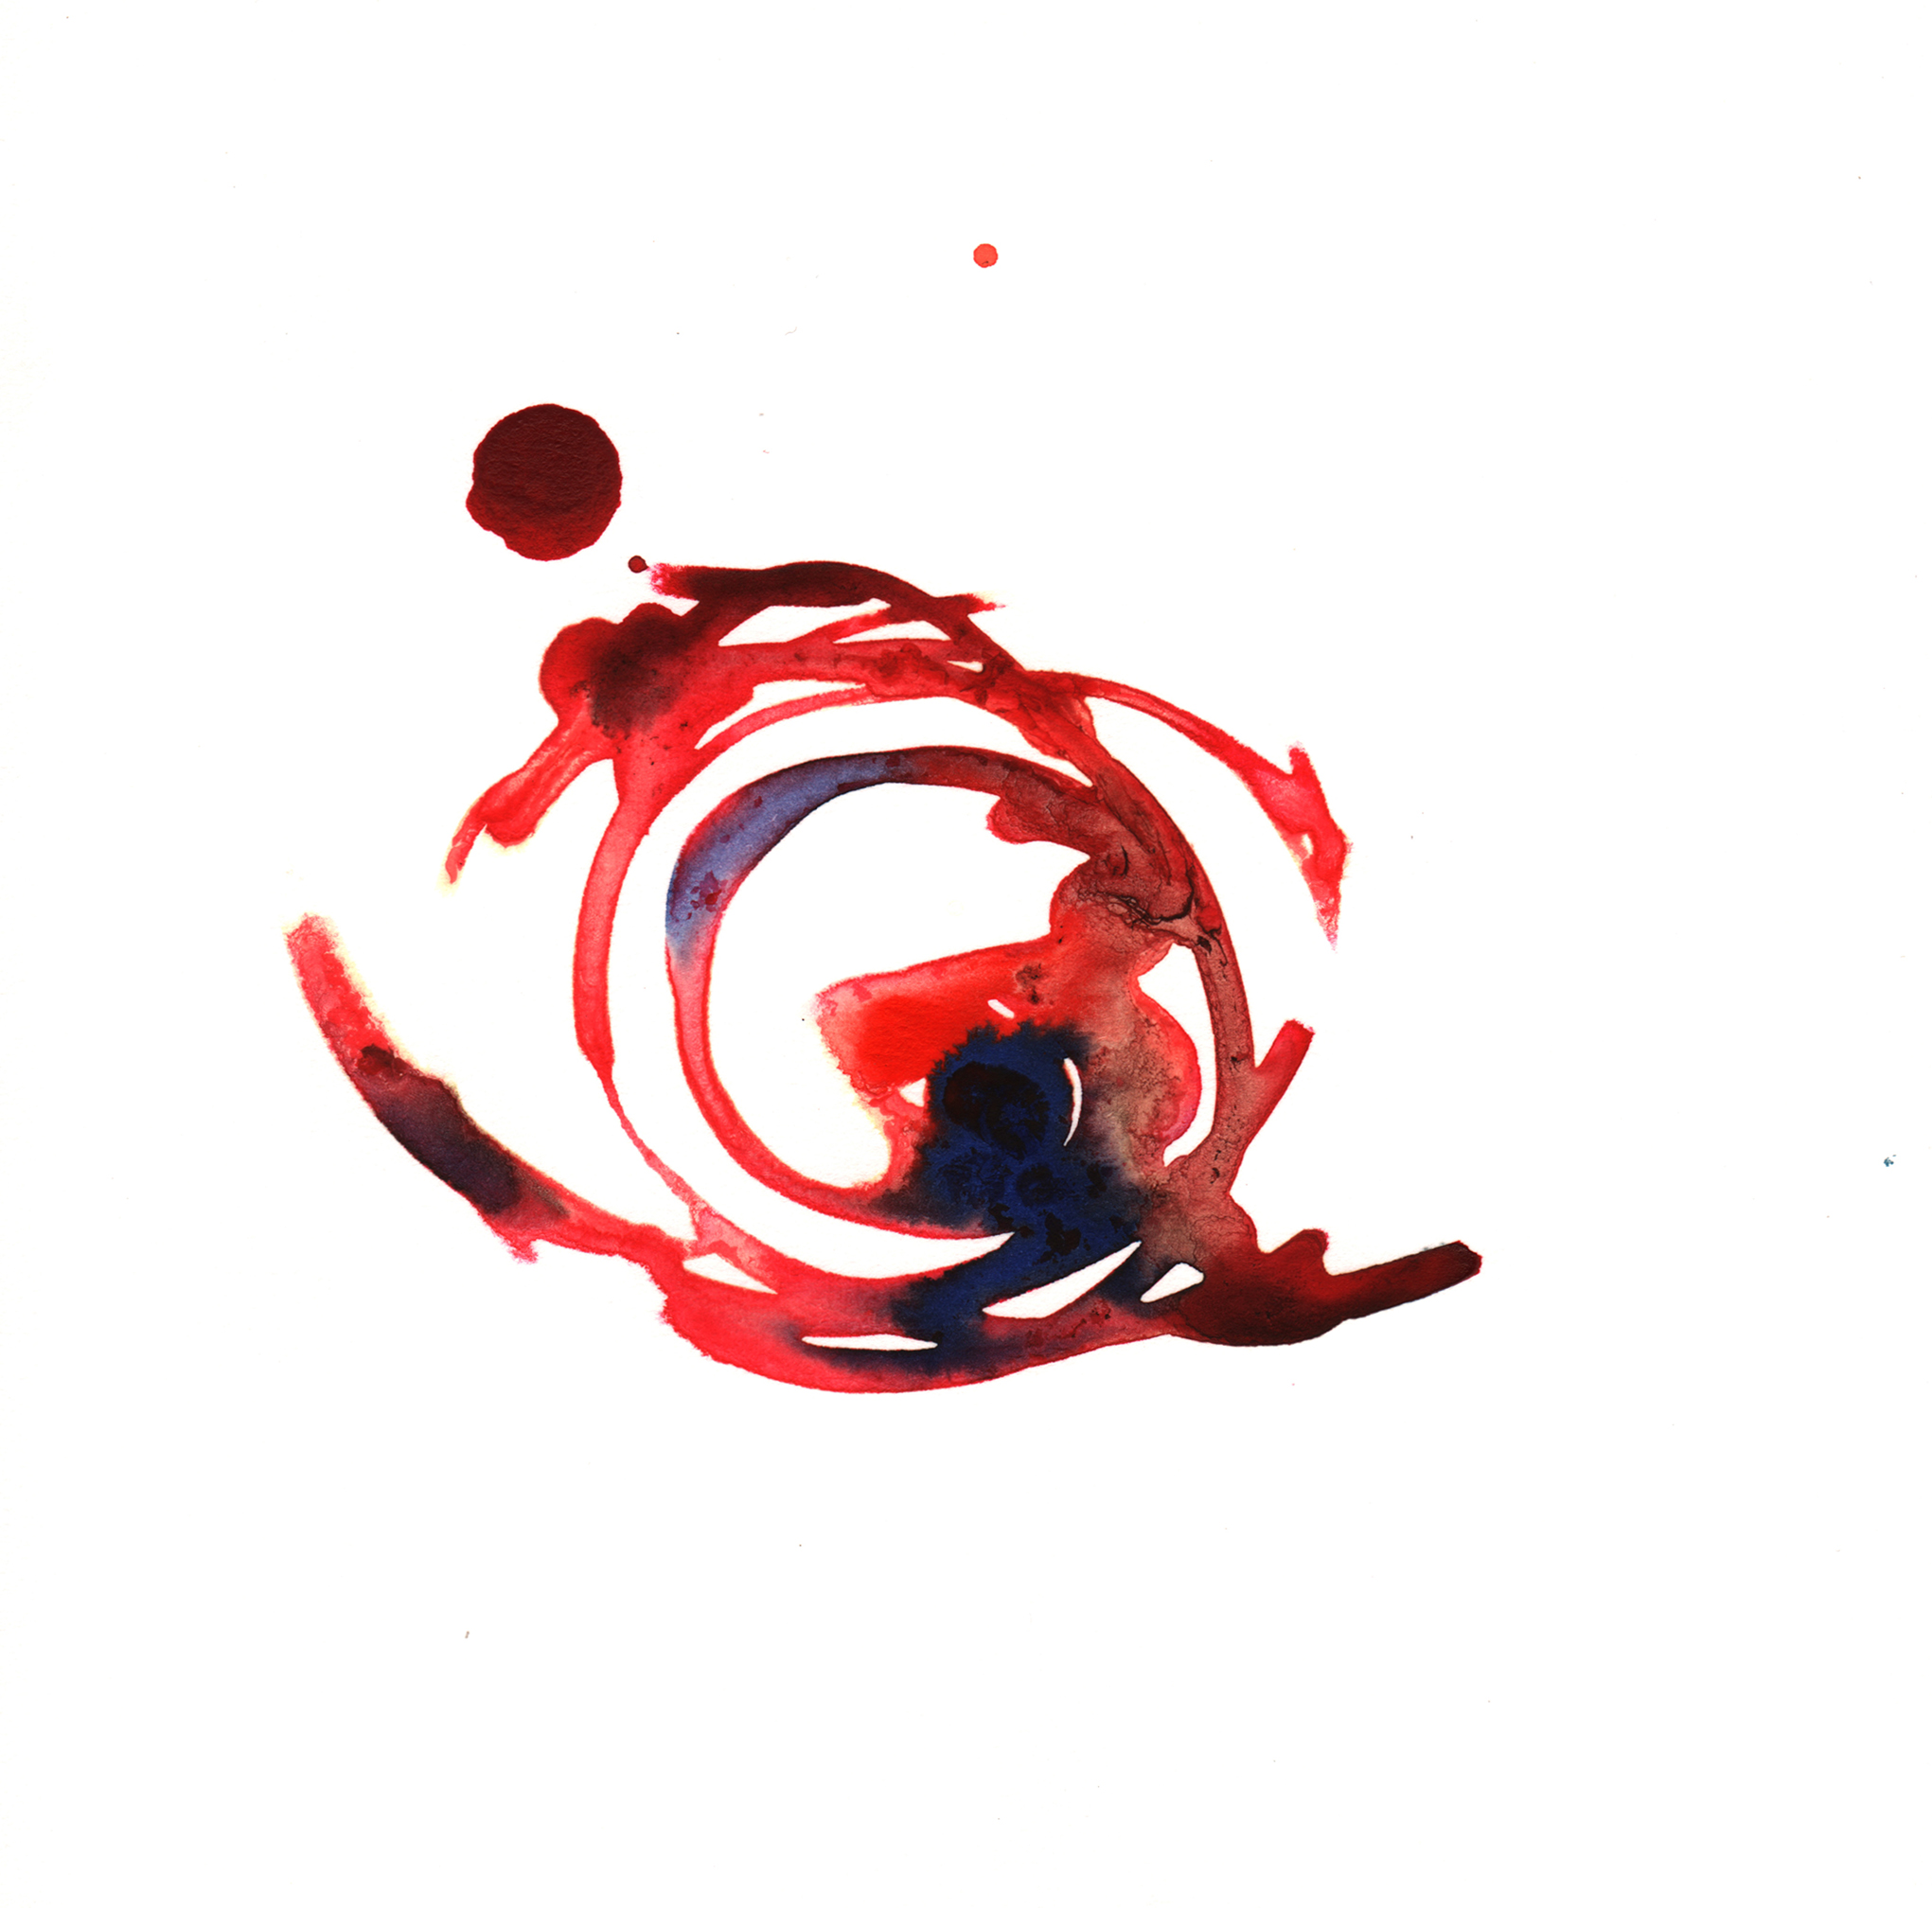 139.Rose.6.27.14.jpg